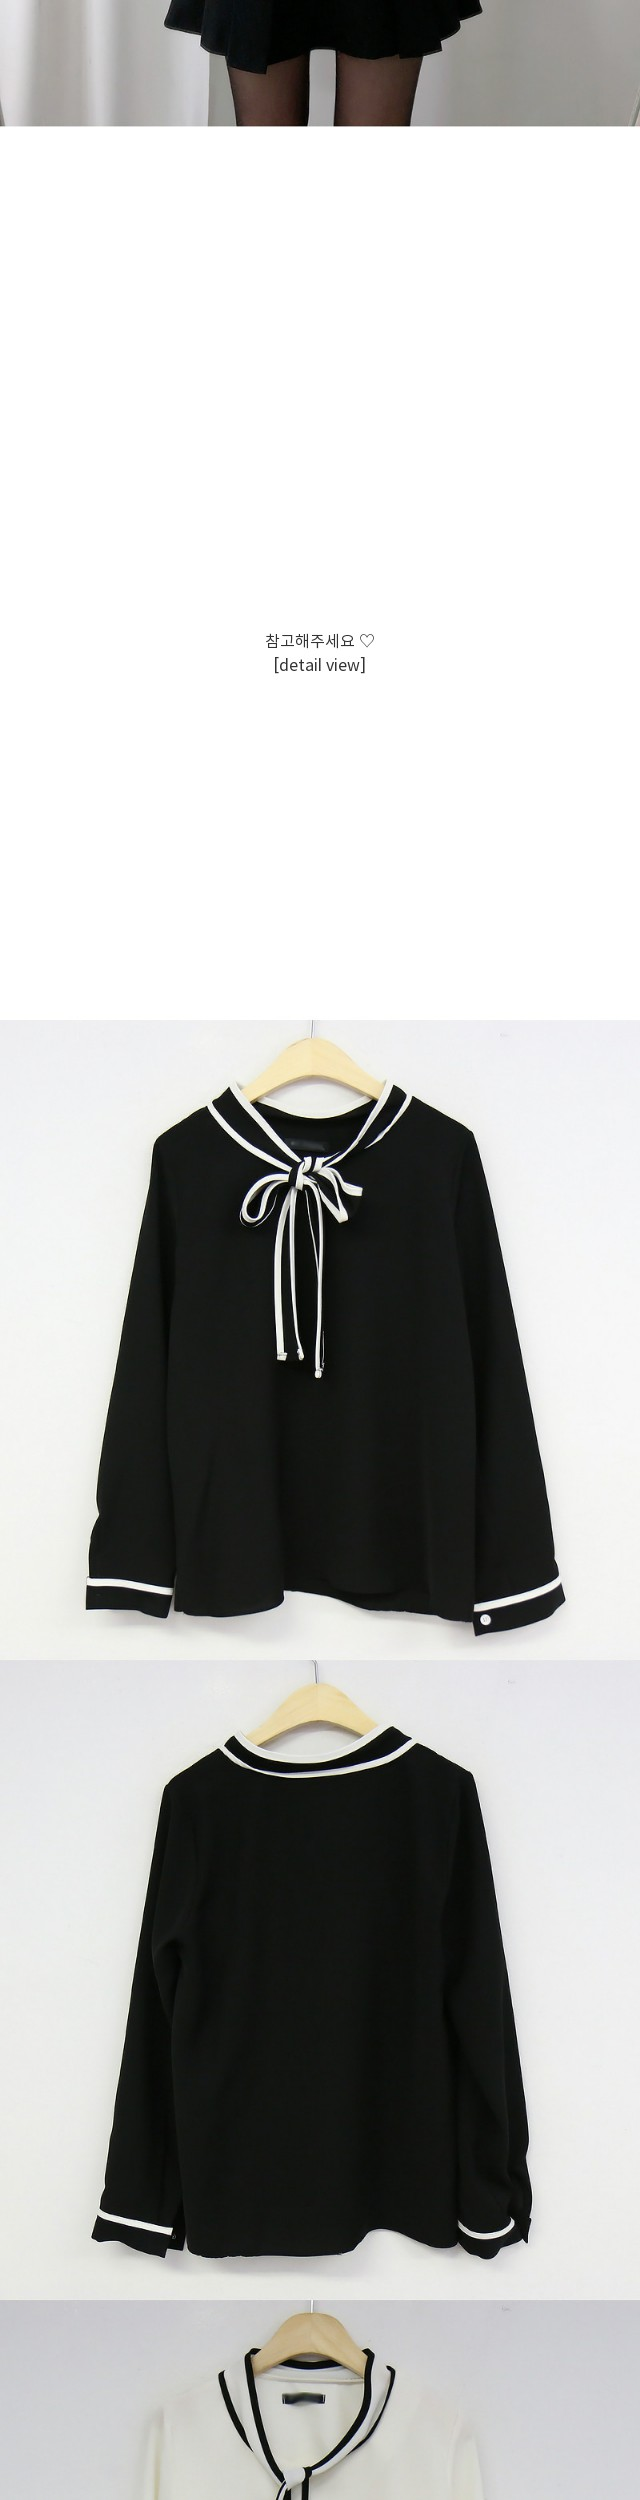 Cami color ribbon blouse